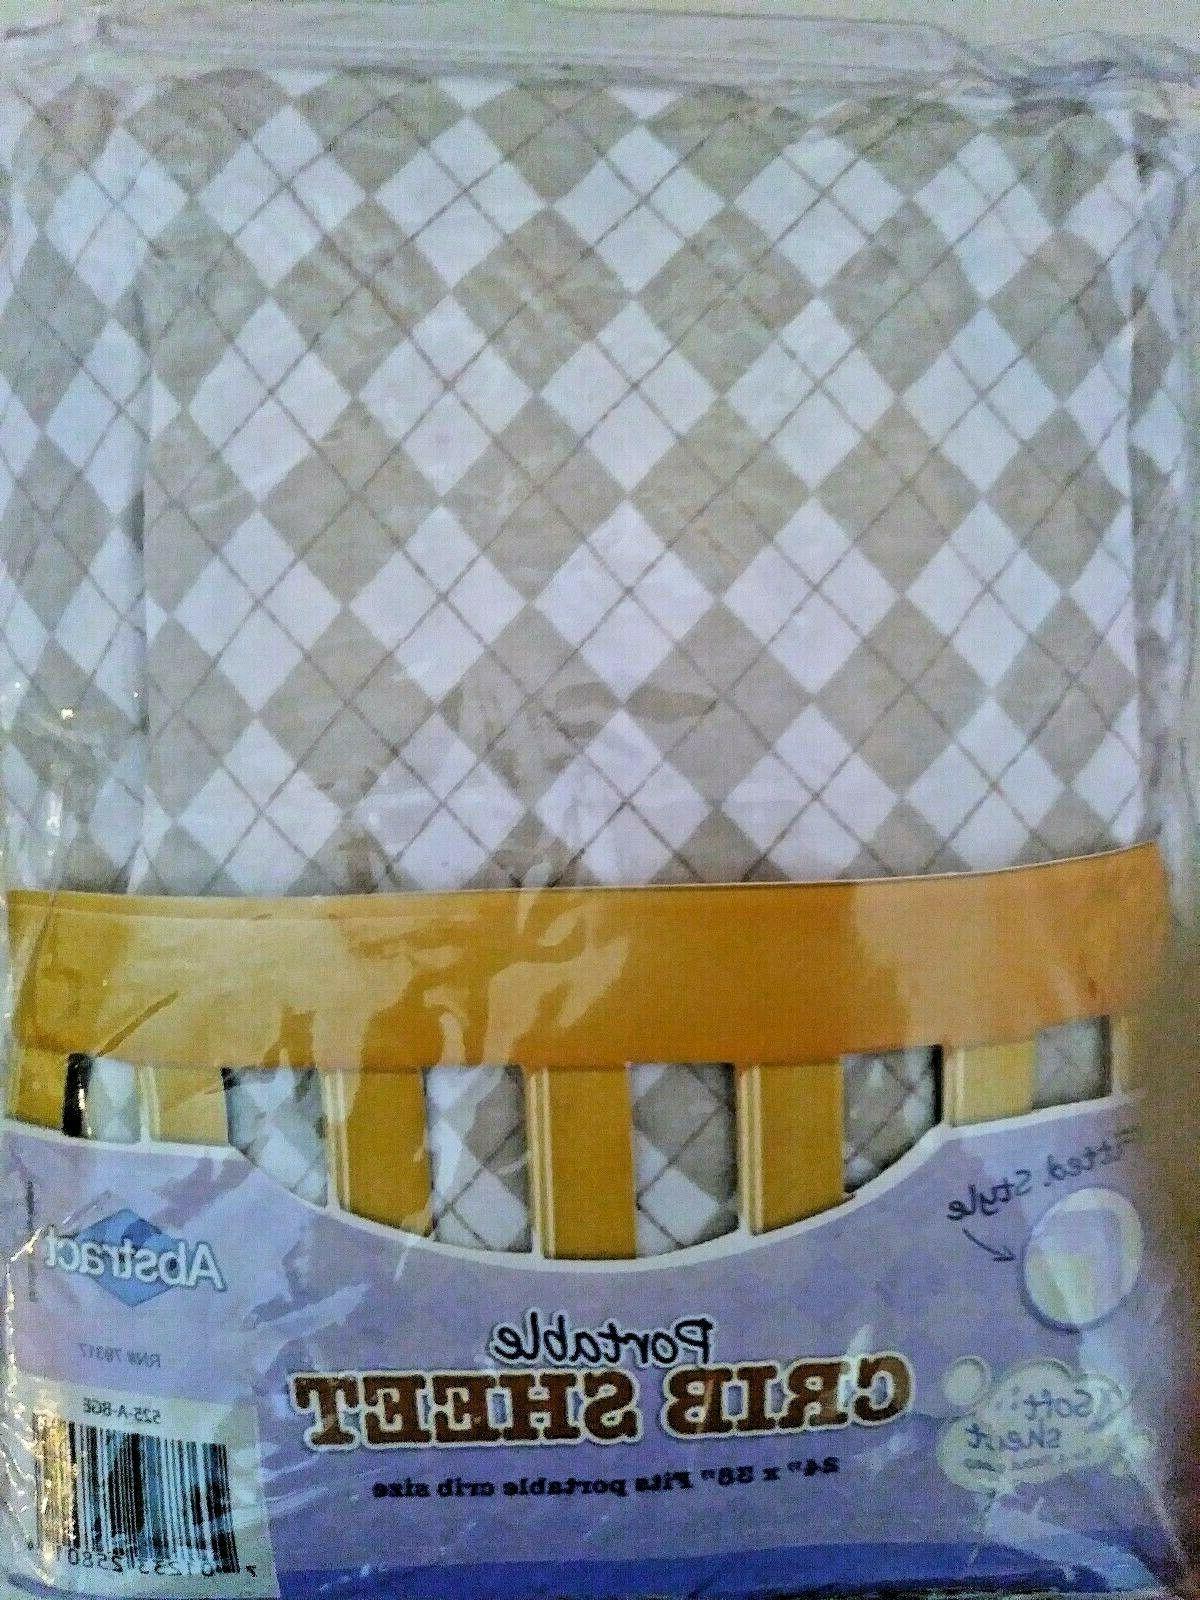 argyle print beige cotton knit jersey 27